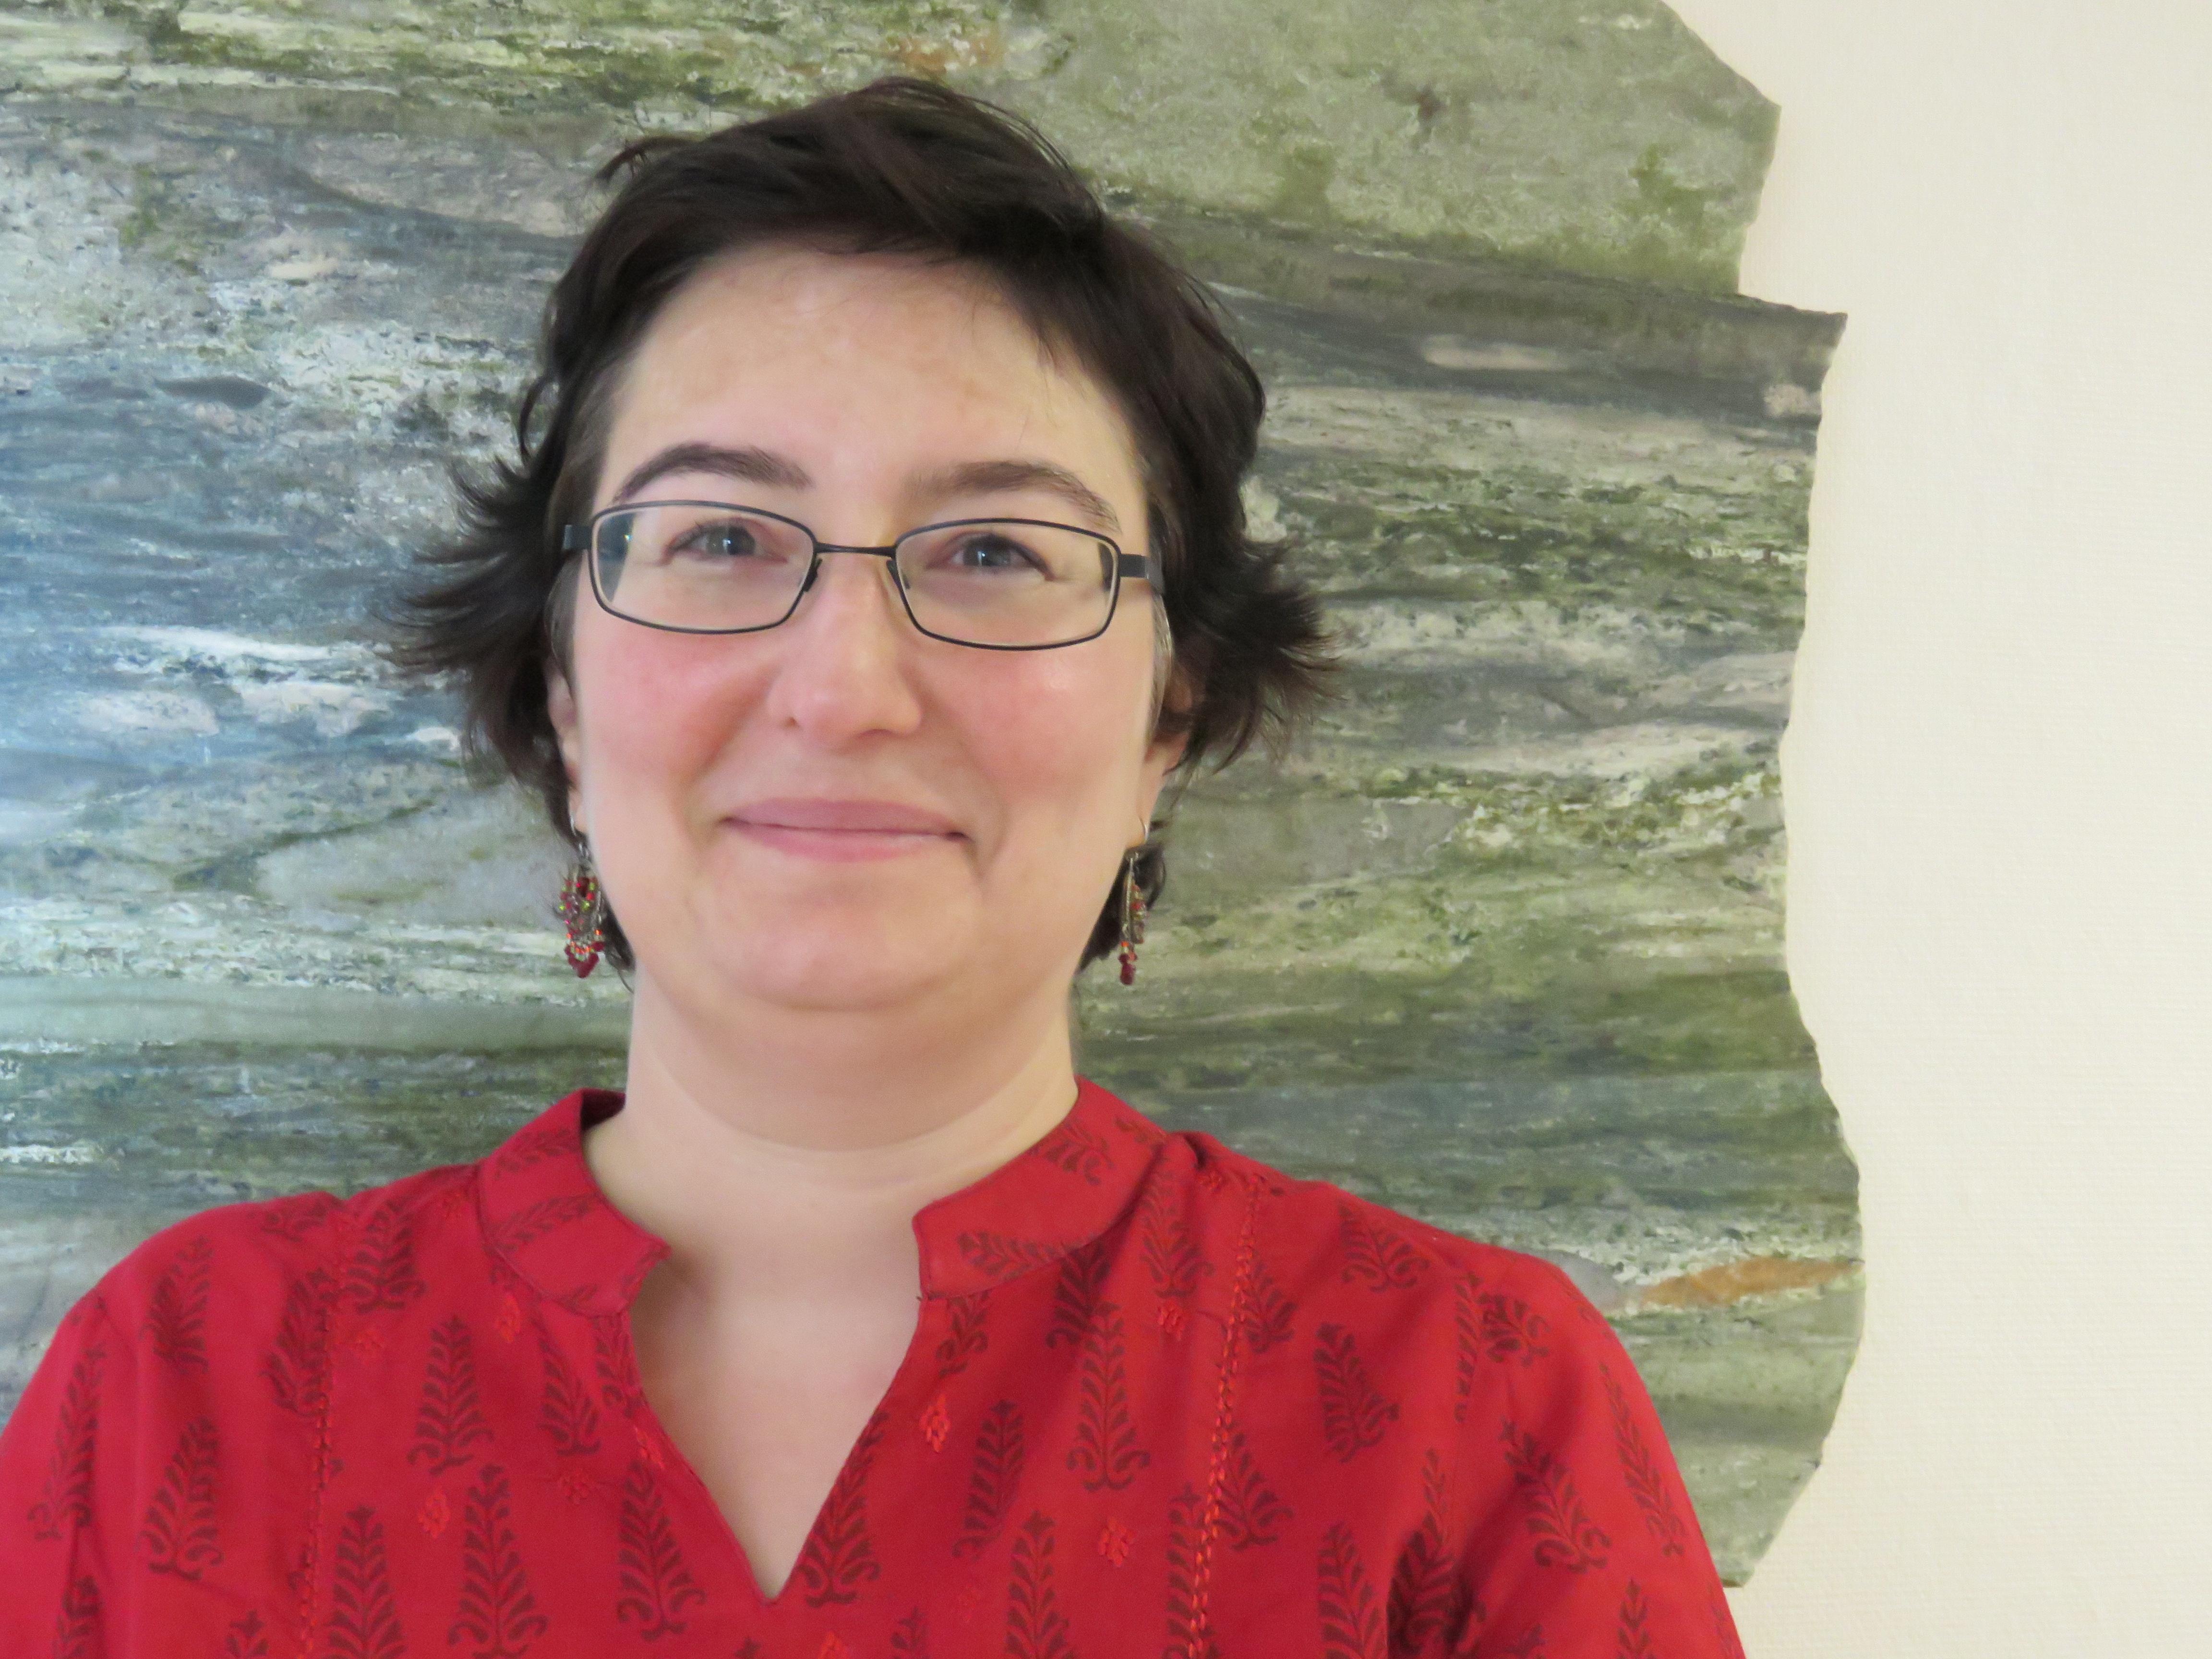 Sylvie Demouchy